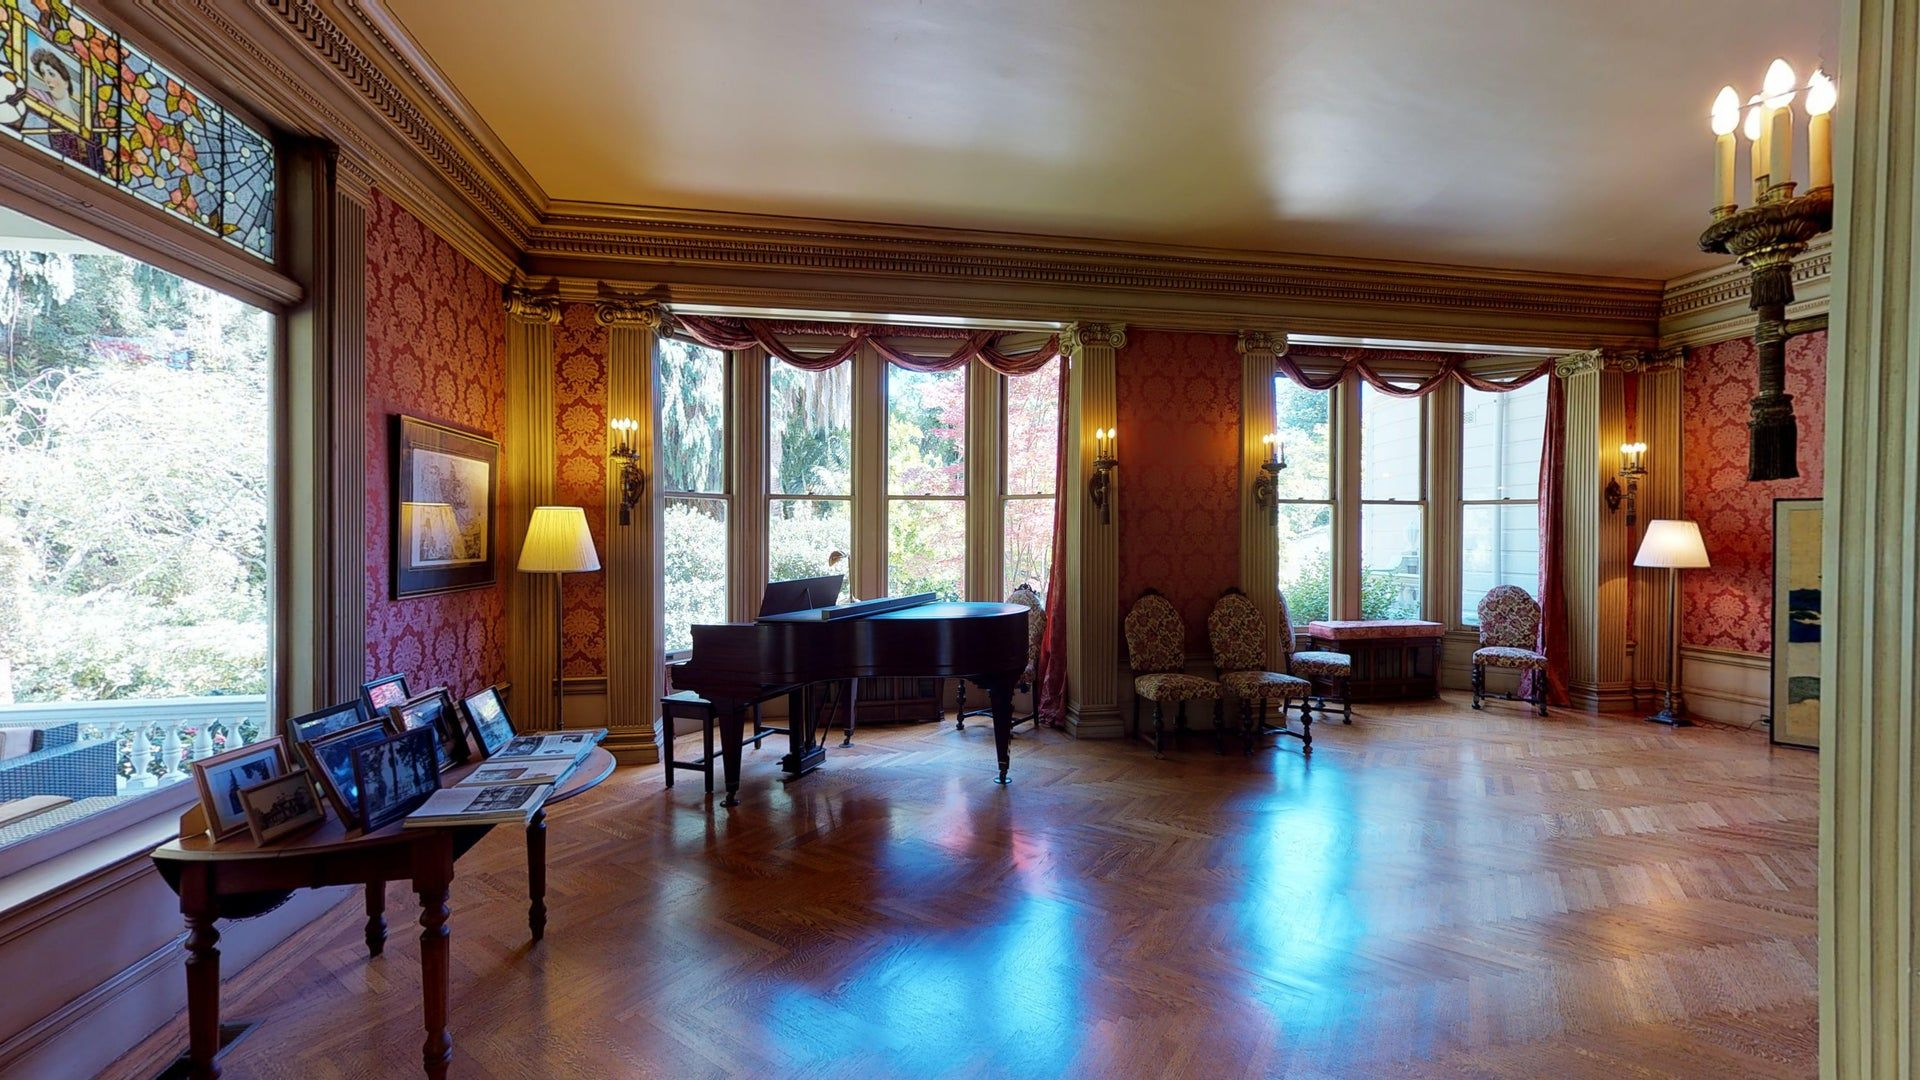 Explore Victorian Tudor Mansion (Pro2) in 3D in 2020